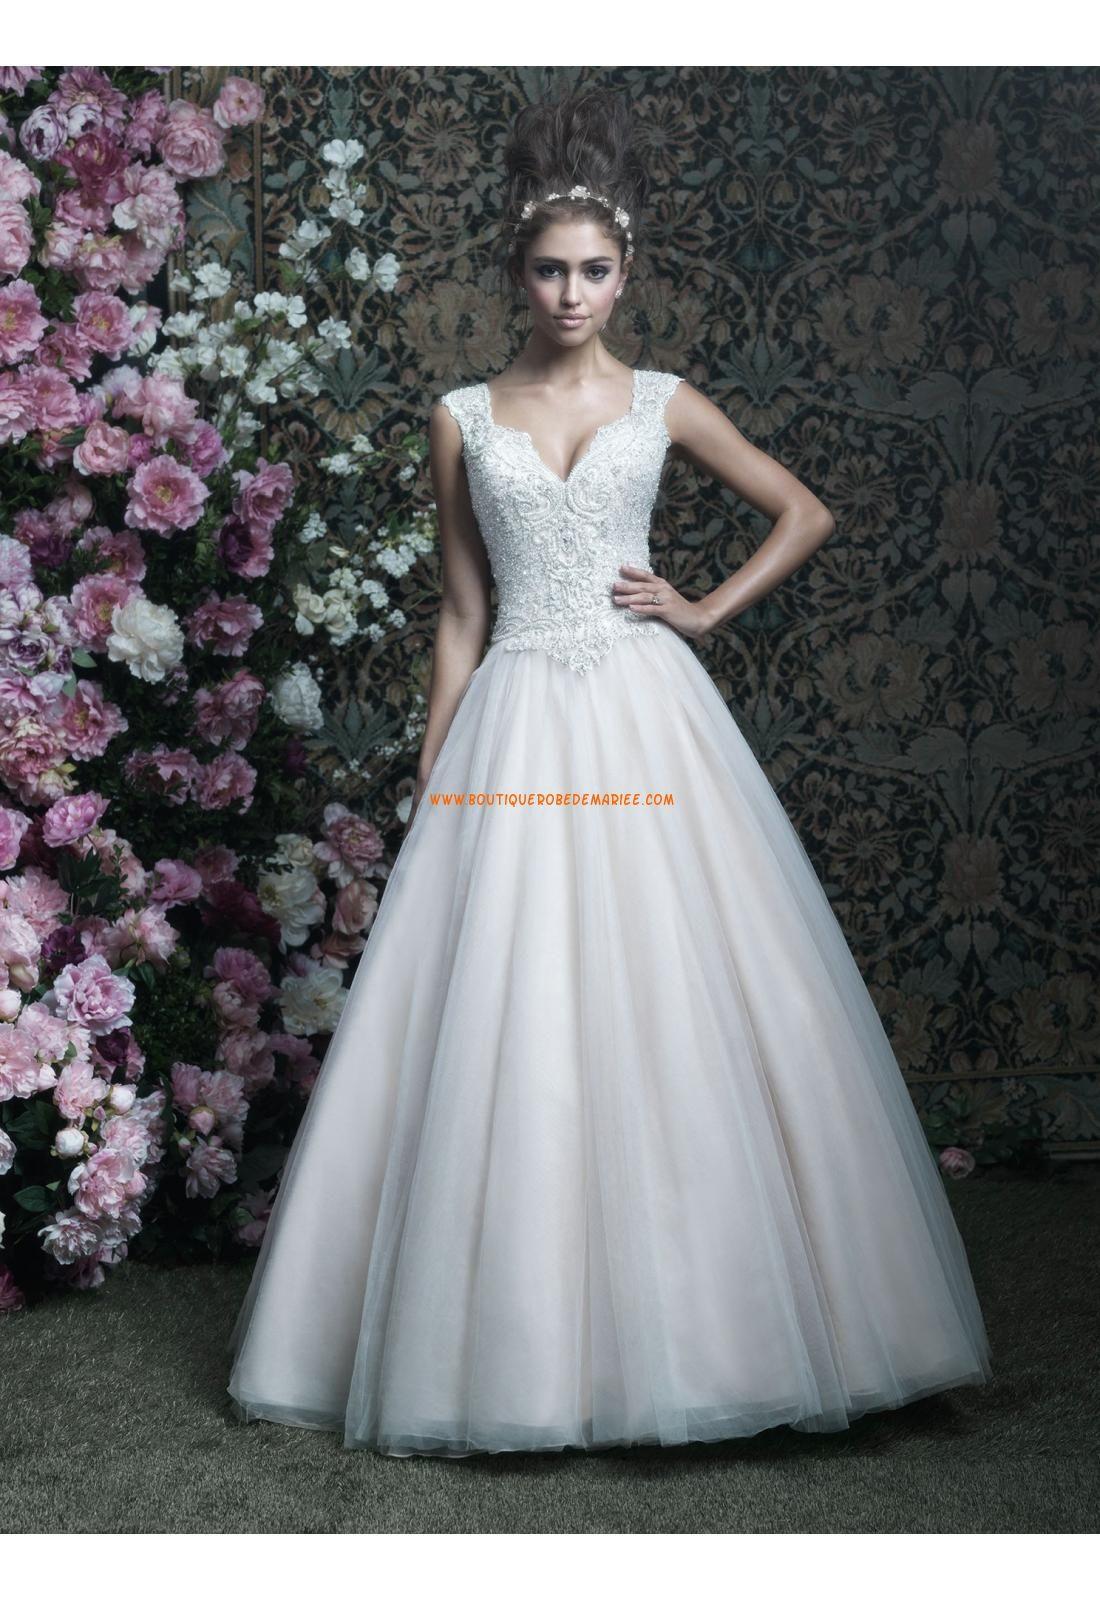 Allure Couture Wedding Dresses - Style C407 [C407] : Wedding Dresses ...